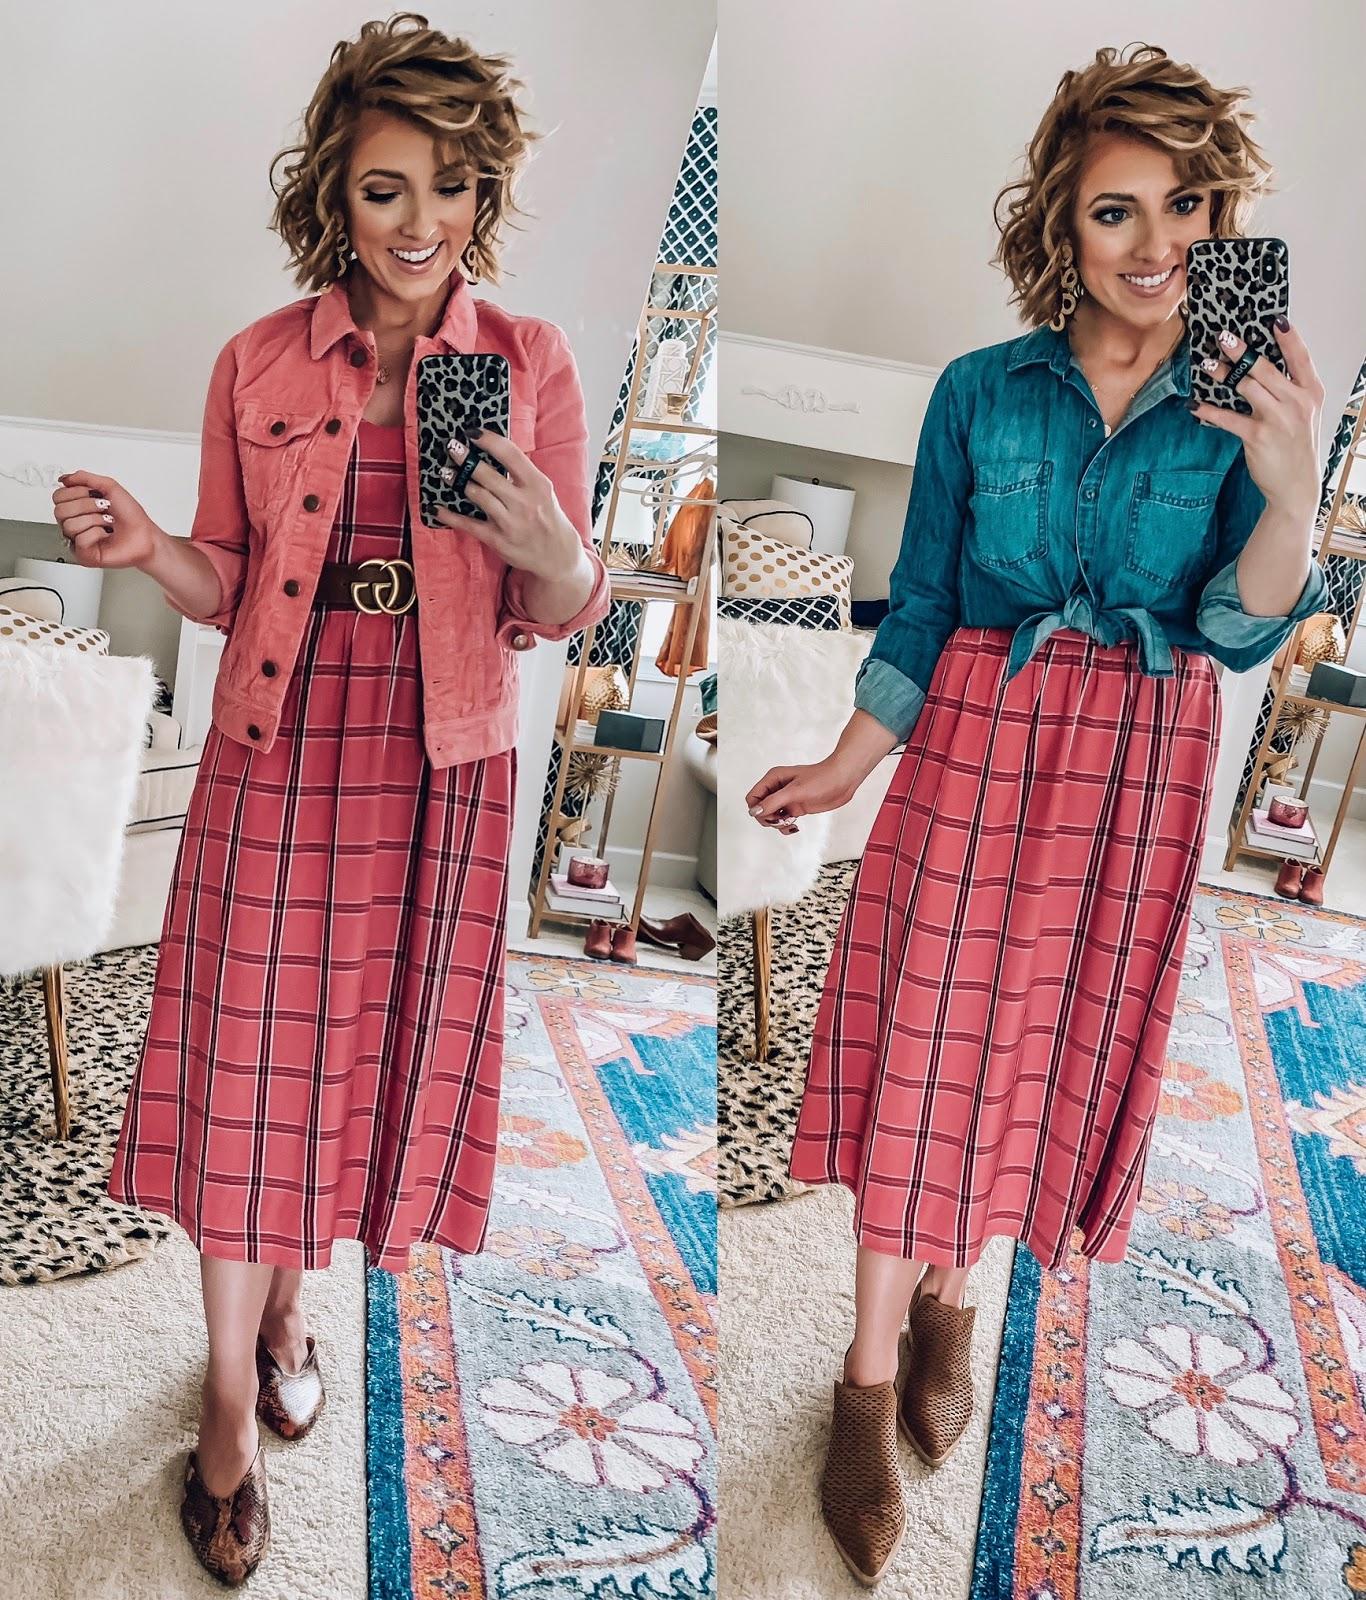 Old Navy Pink & Burgundy Plaid Midi Dress styled Four Ways  - Somethig Delightful Blog #affordablefashion